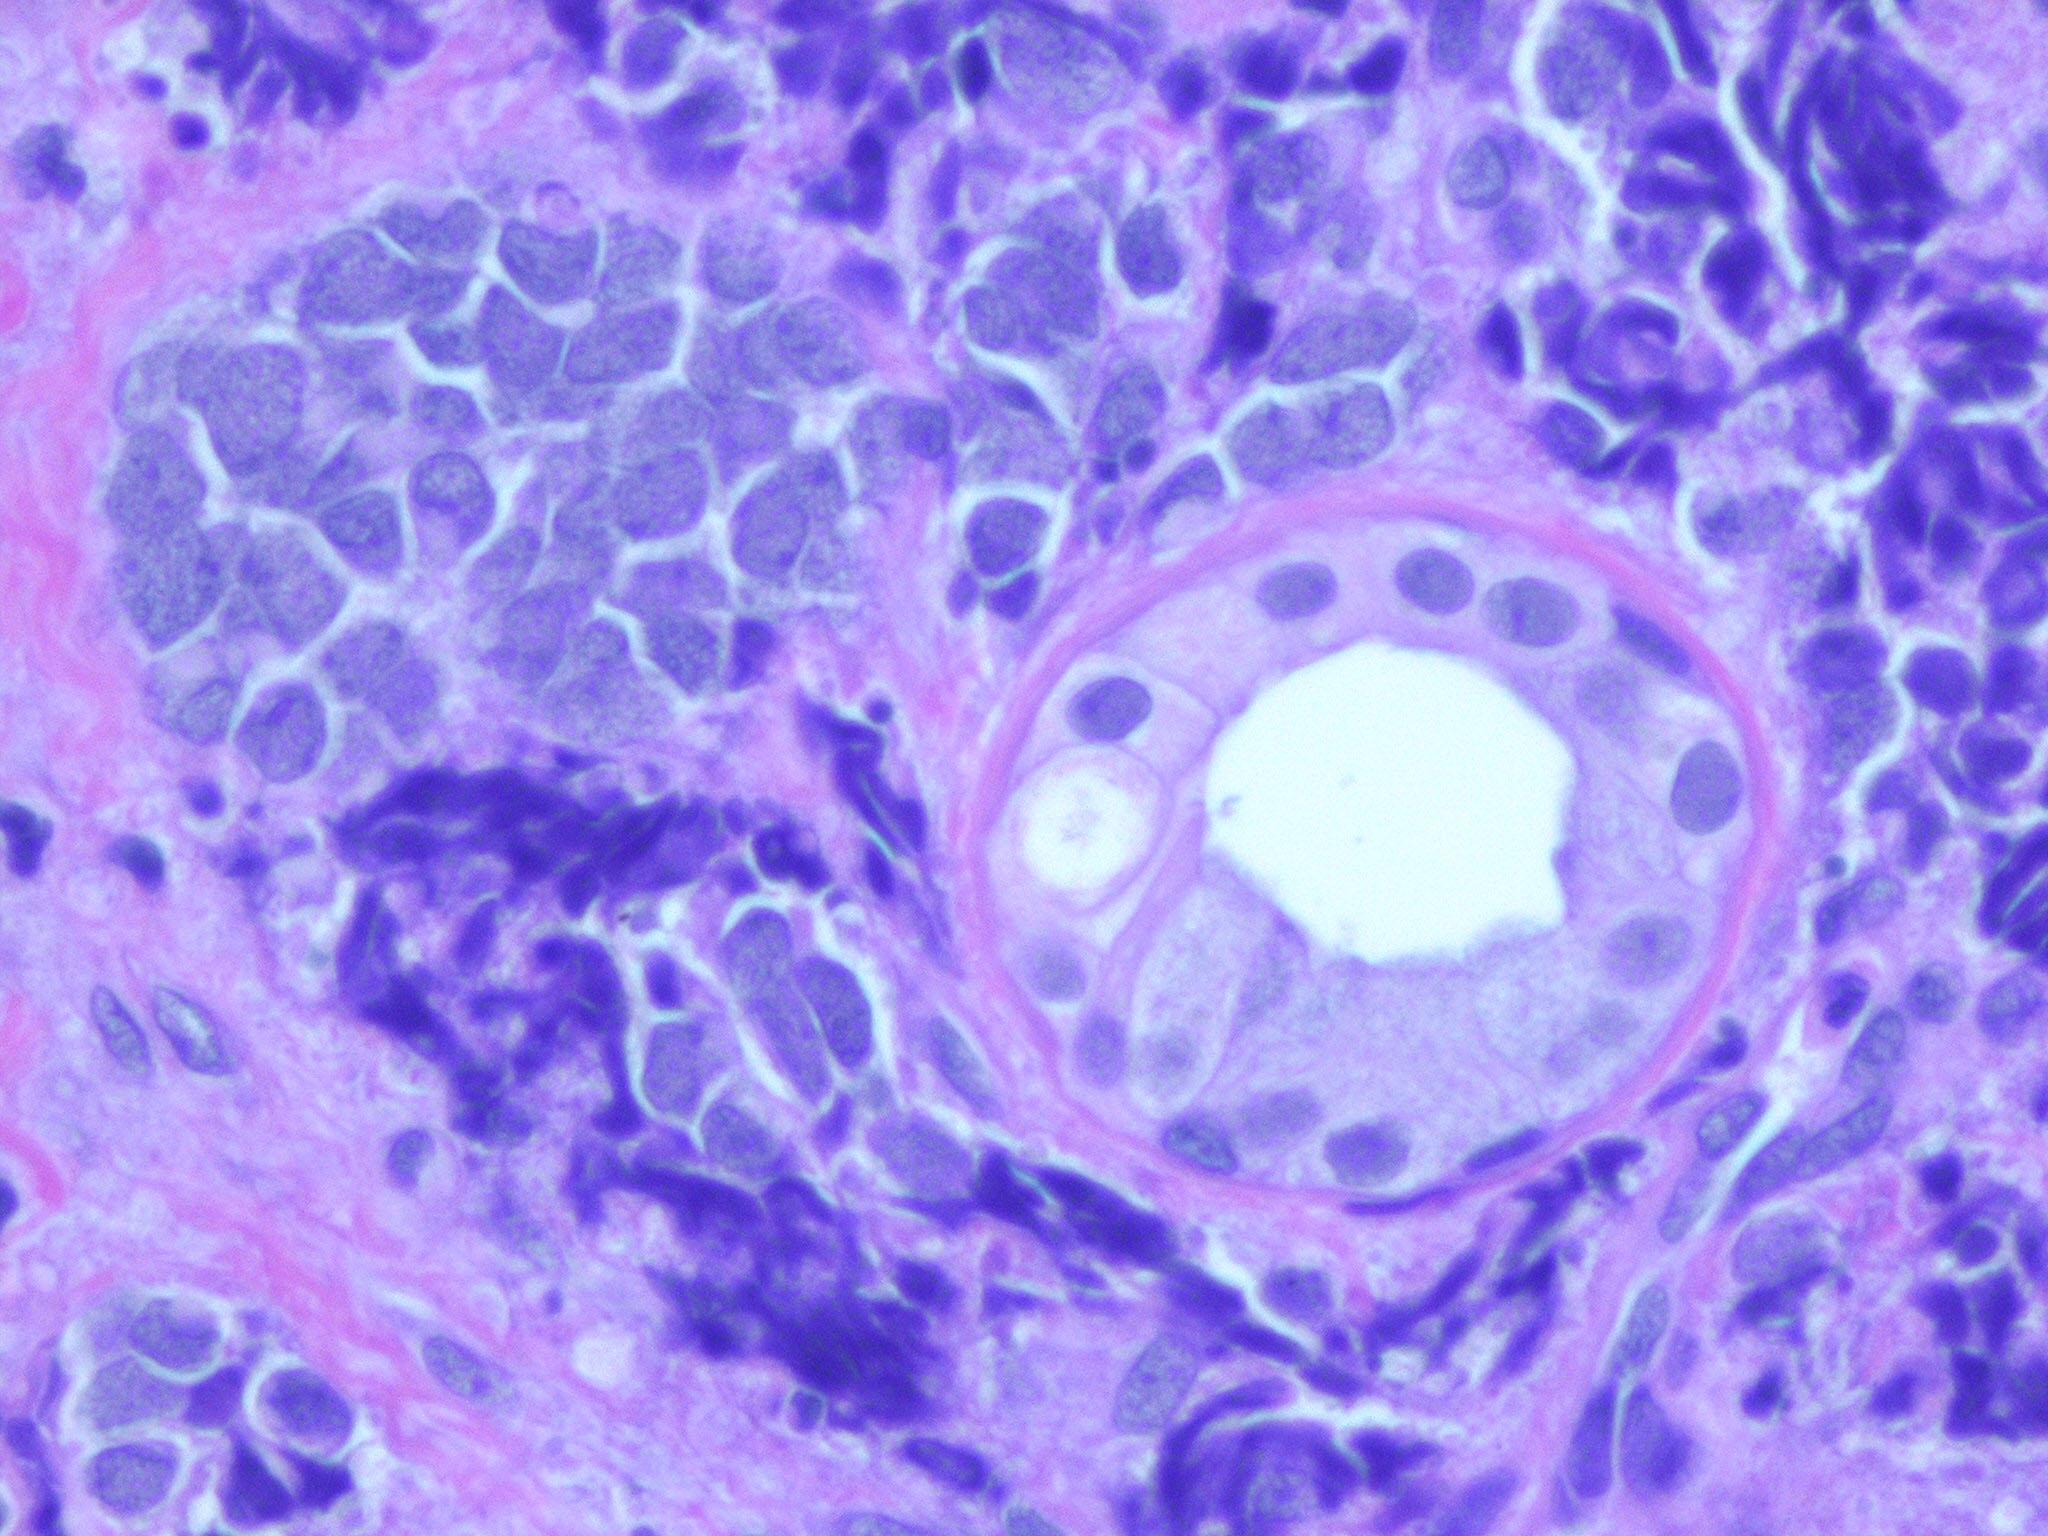 carcinoma cellule di Merkel21.jpg